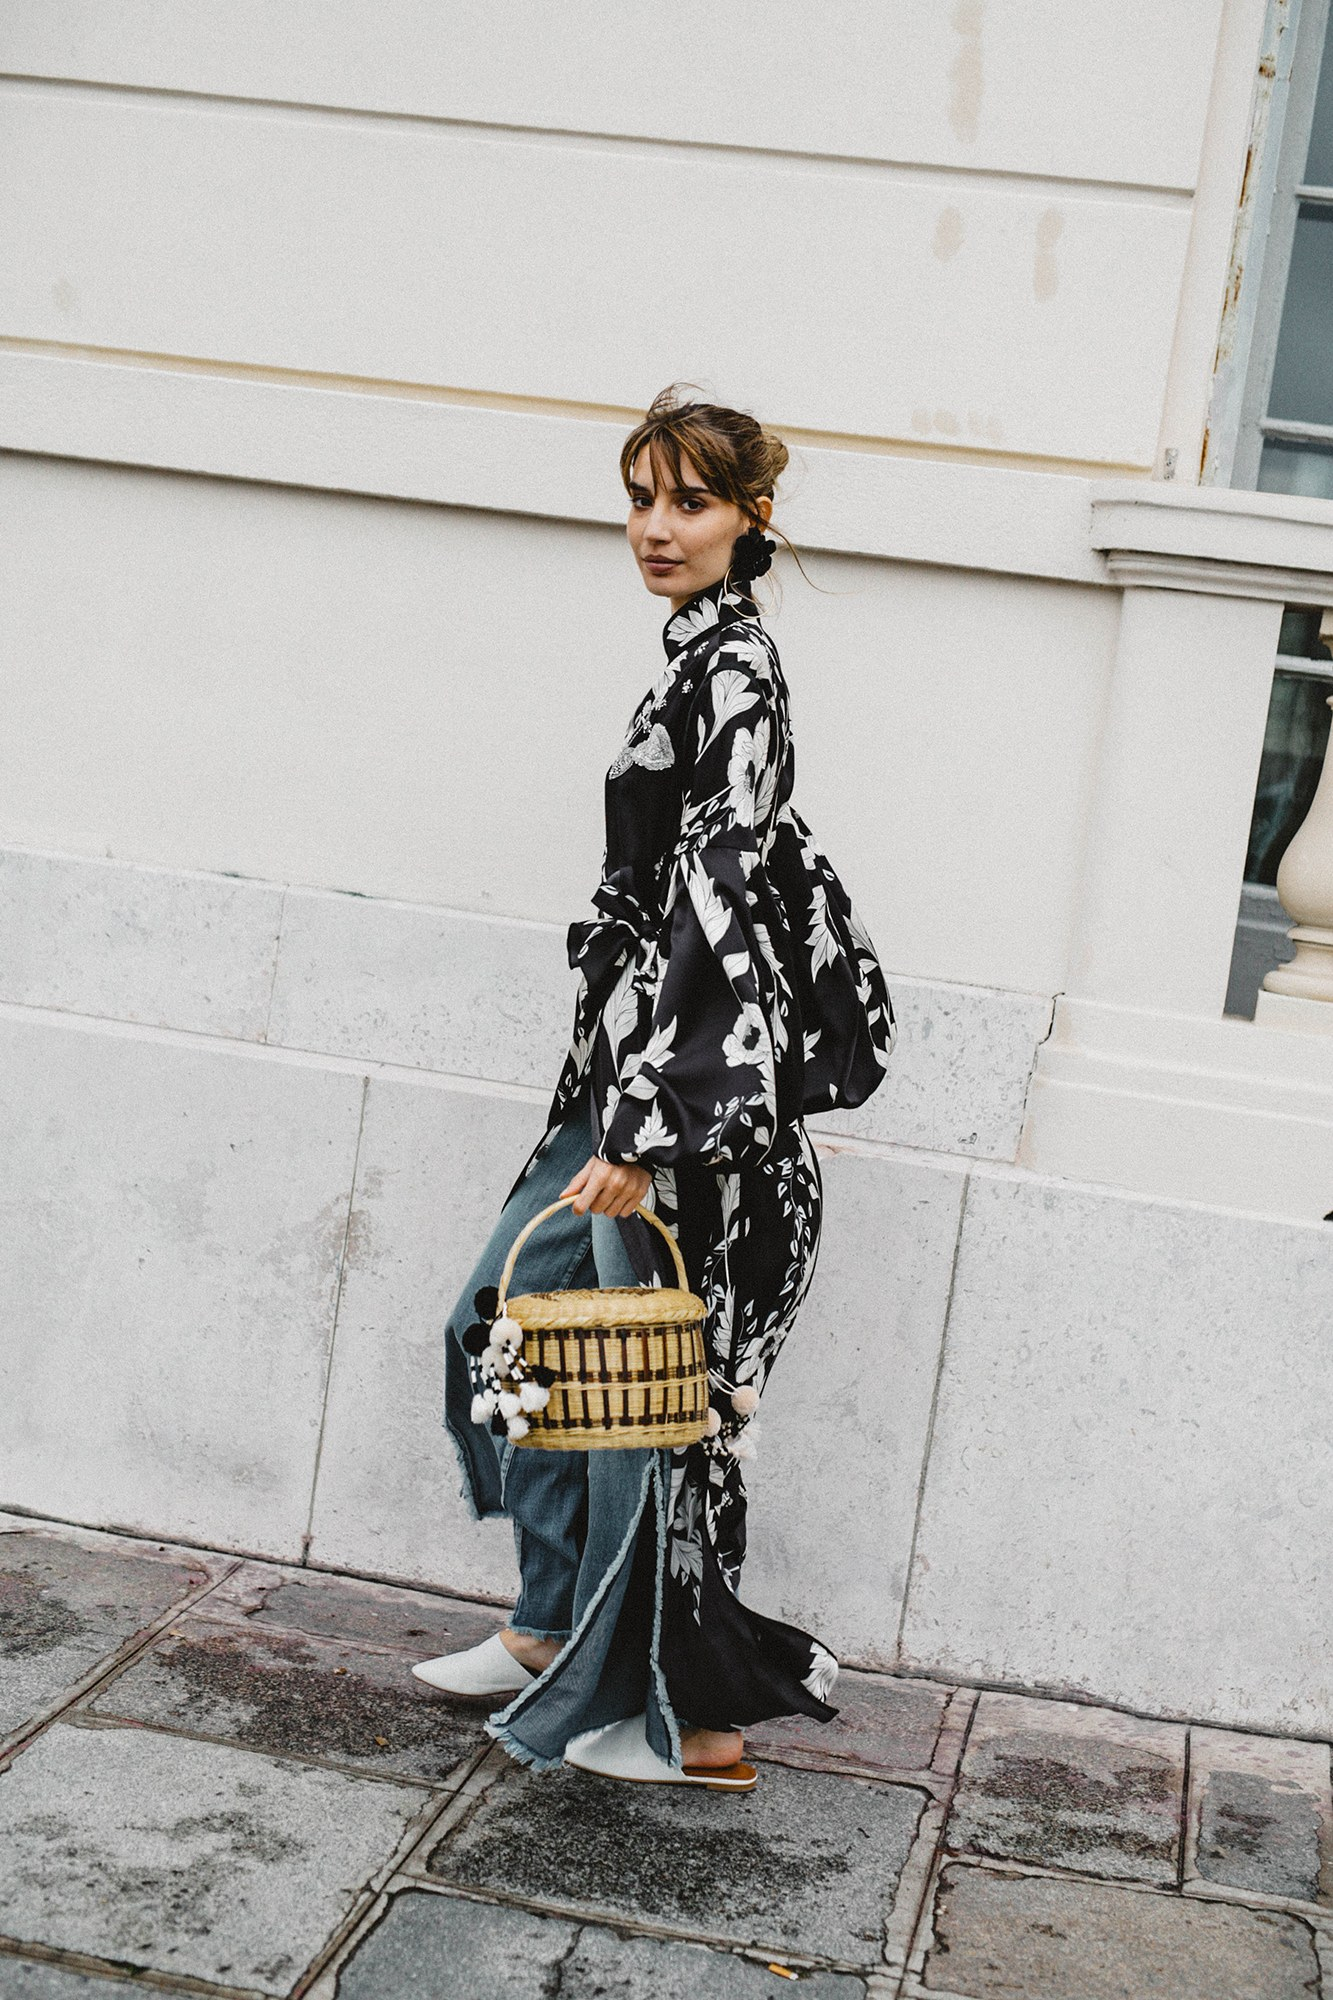 21-johanna-ortiz-spring-2018-ready-to-wear.jpg